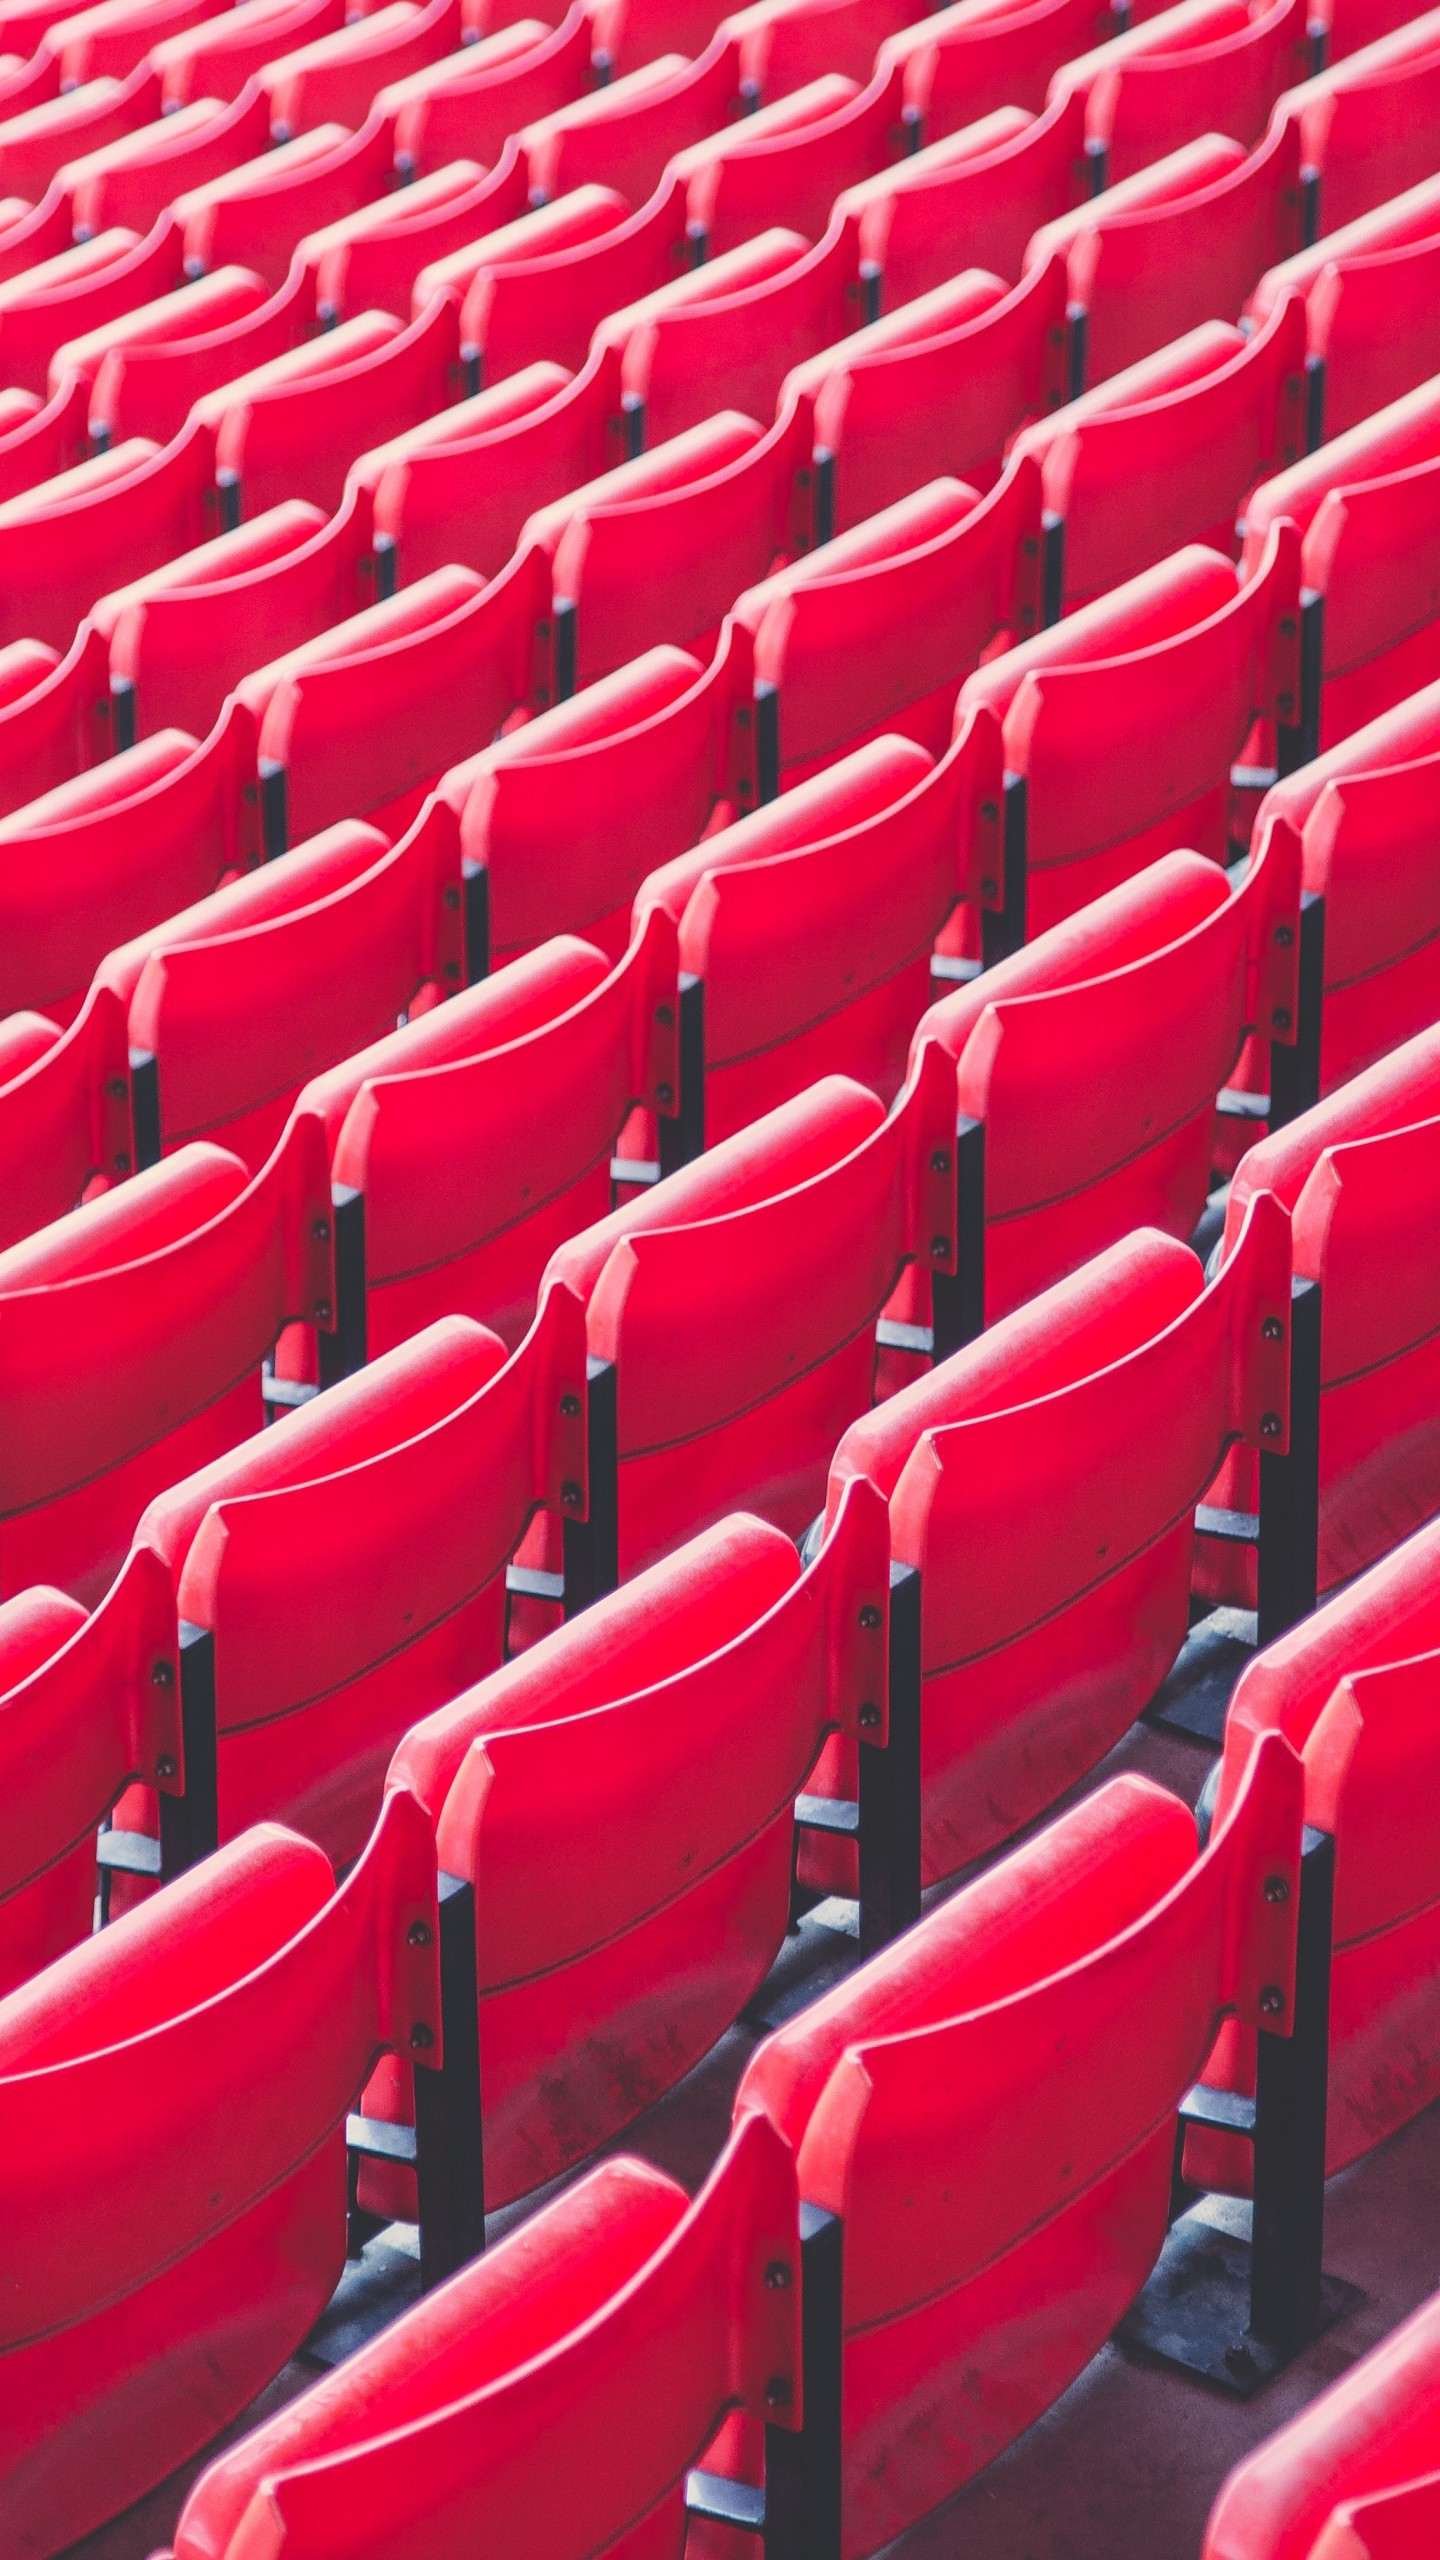 عکس زمینه صندلی قرمز رنگ خالی استادیوم پس زمینه